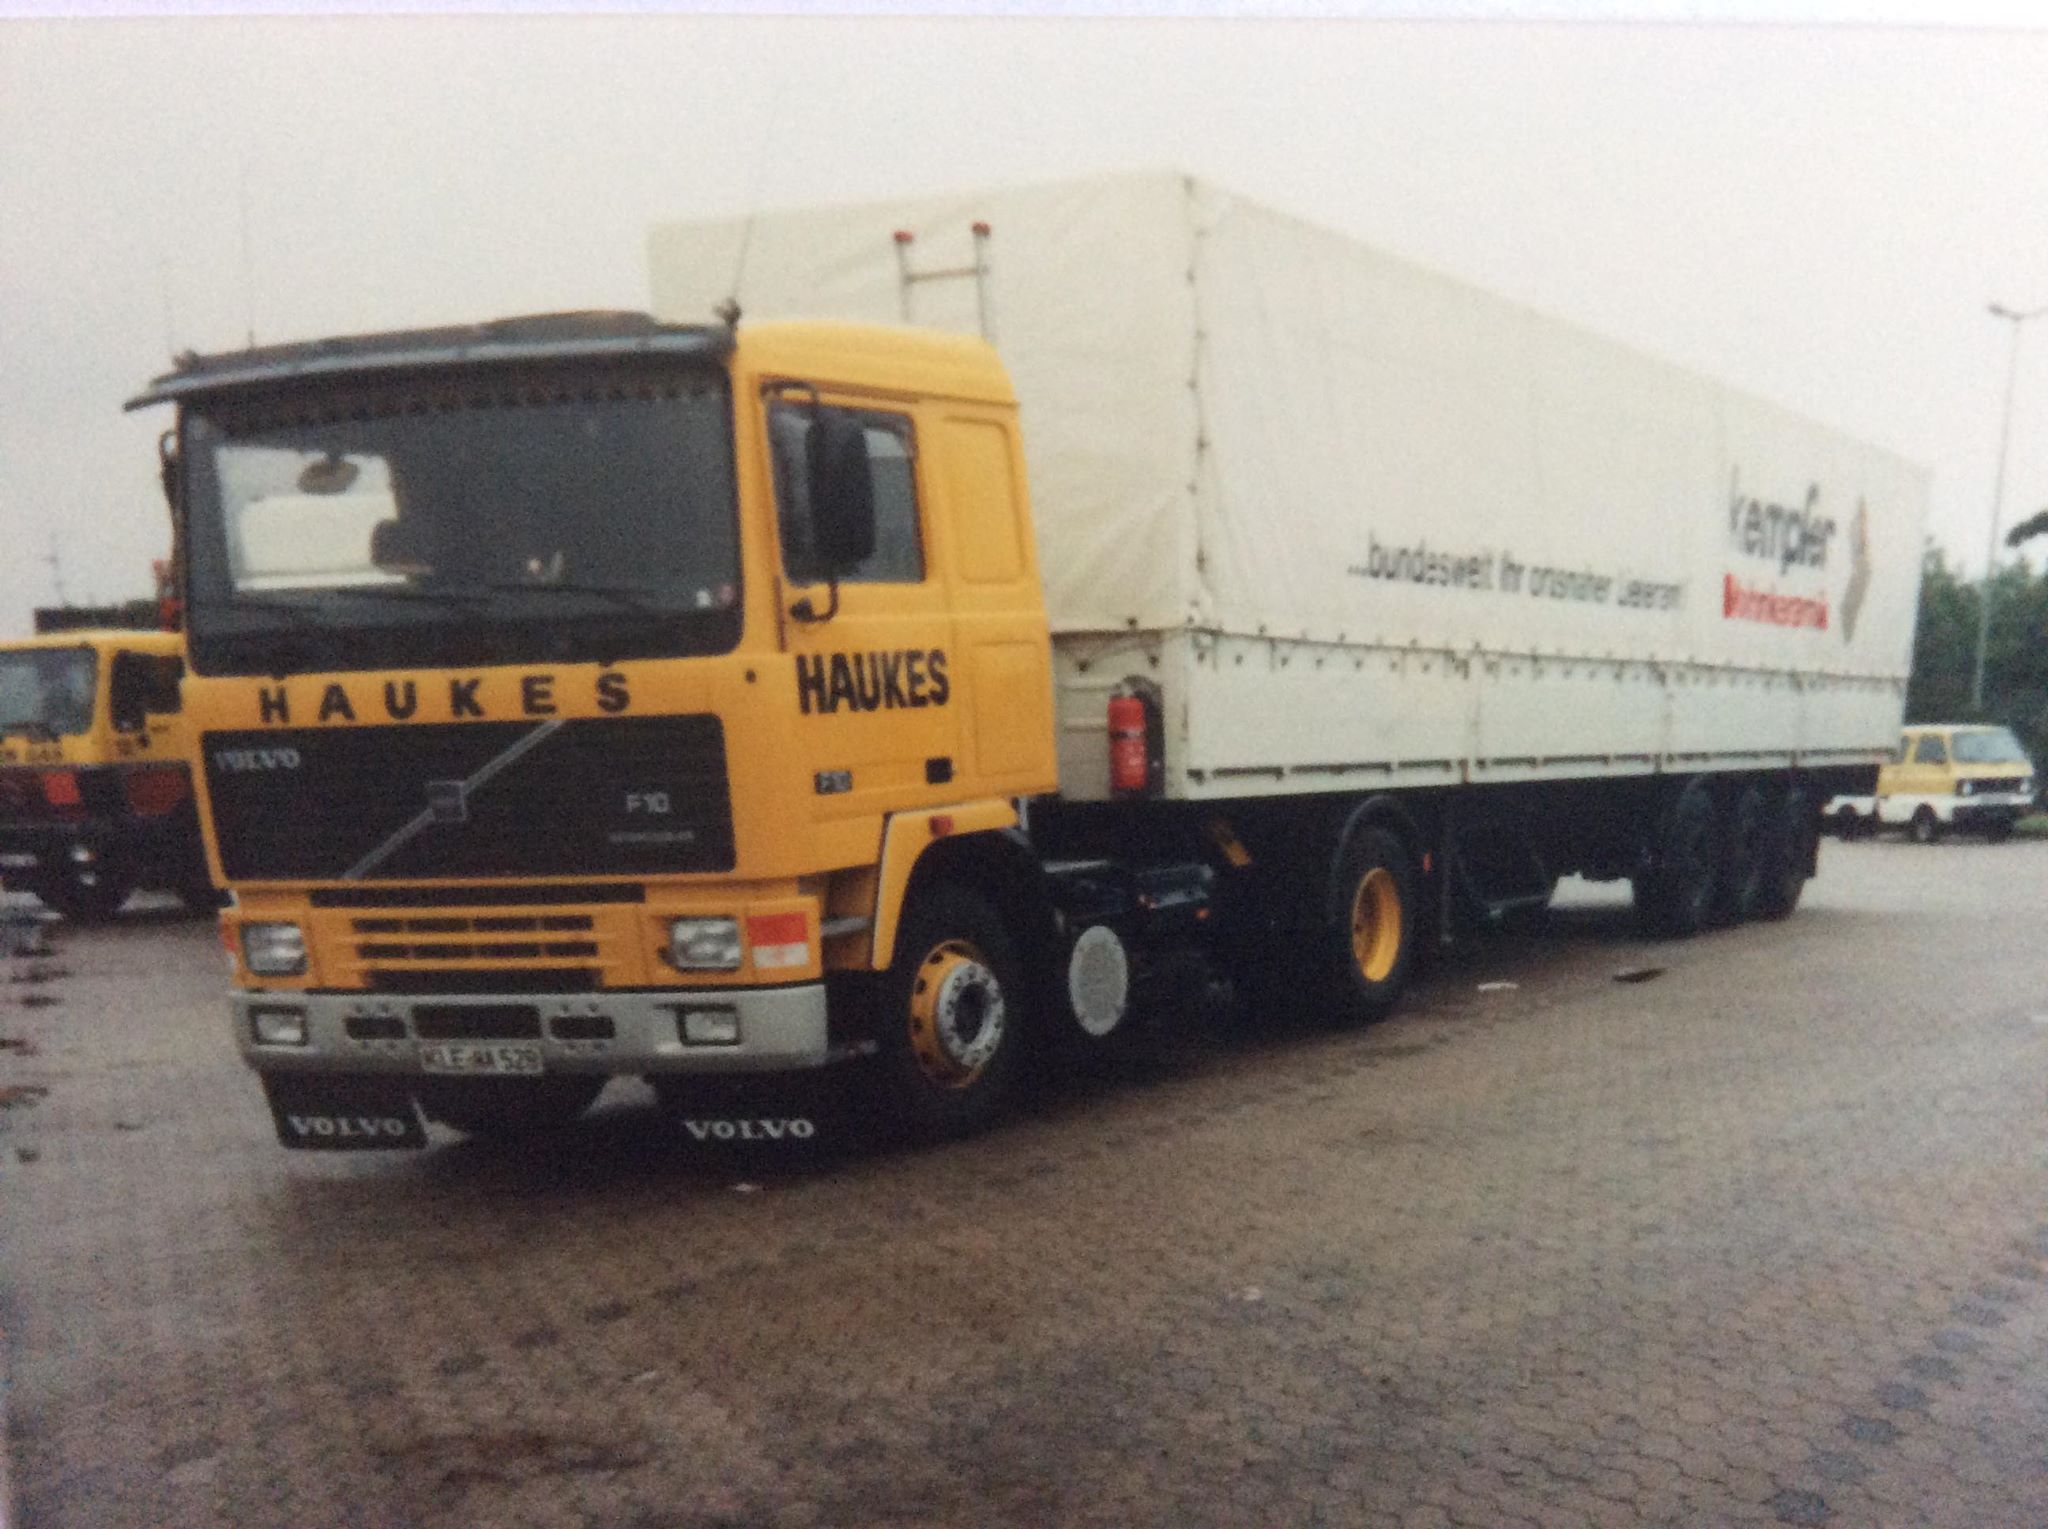 Volvo-Henk-Schmitjes-foto-archief-37